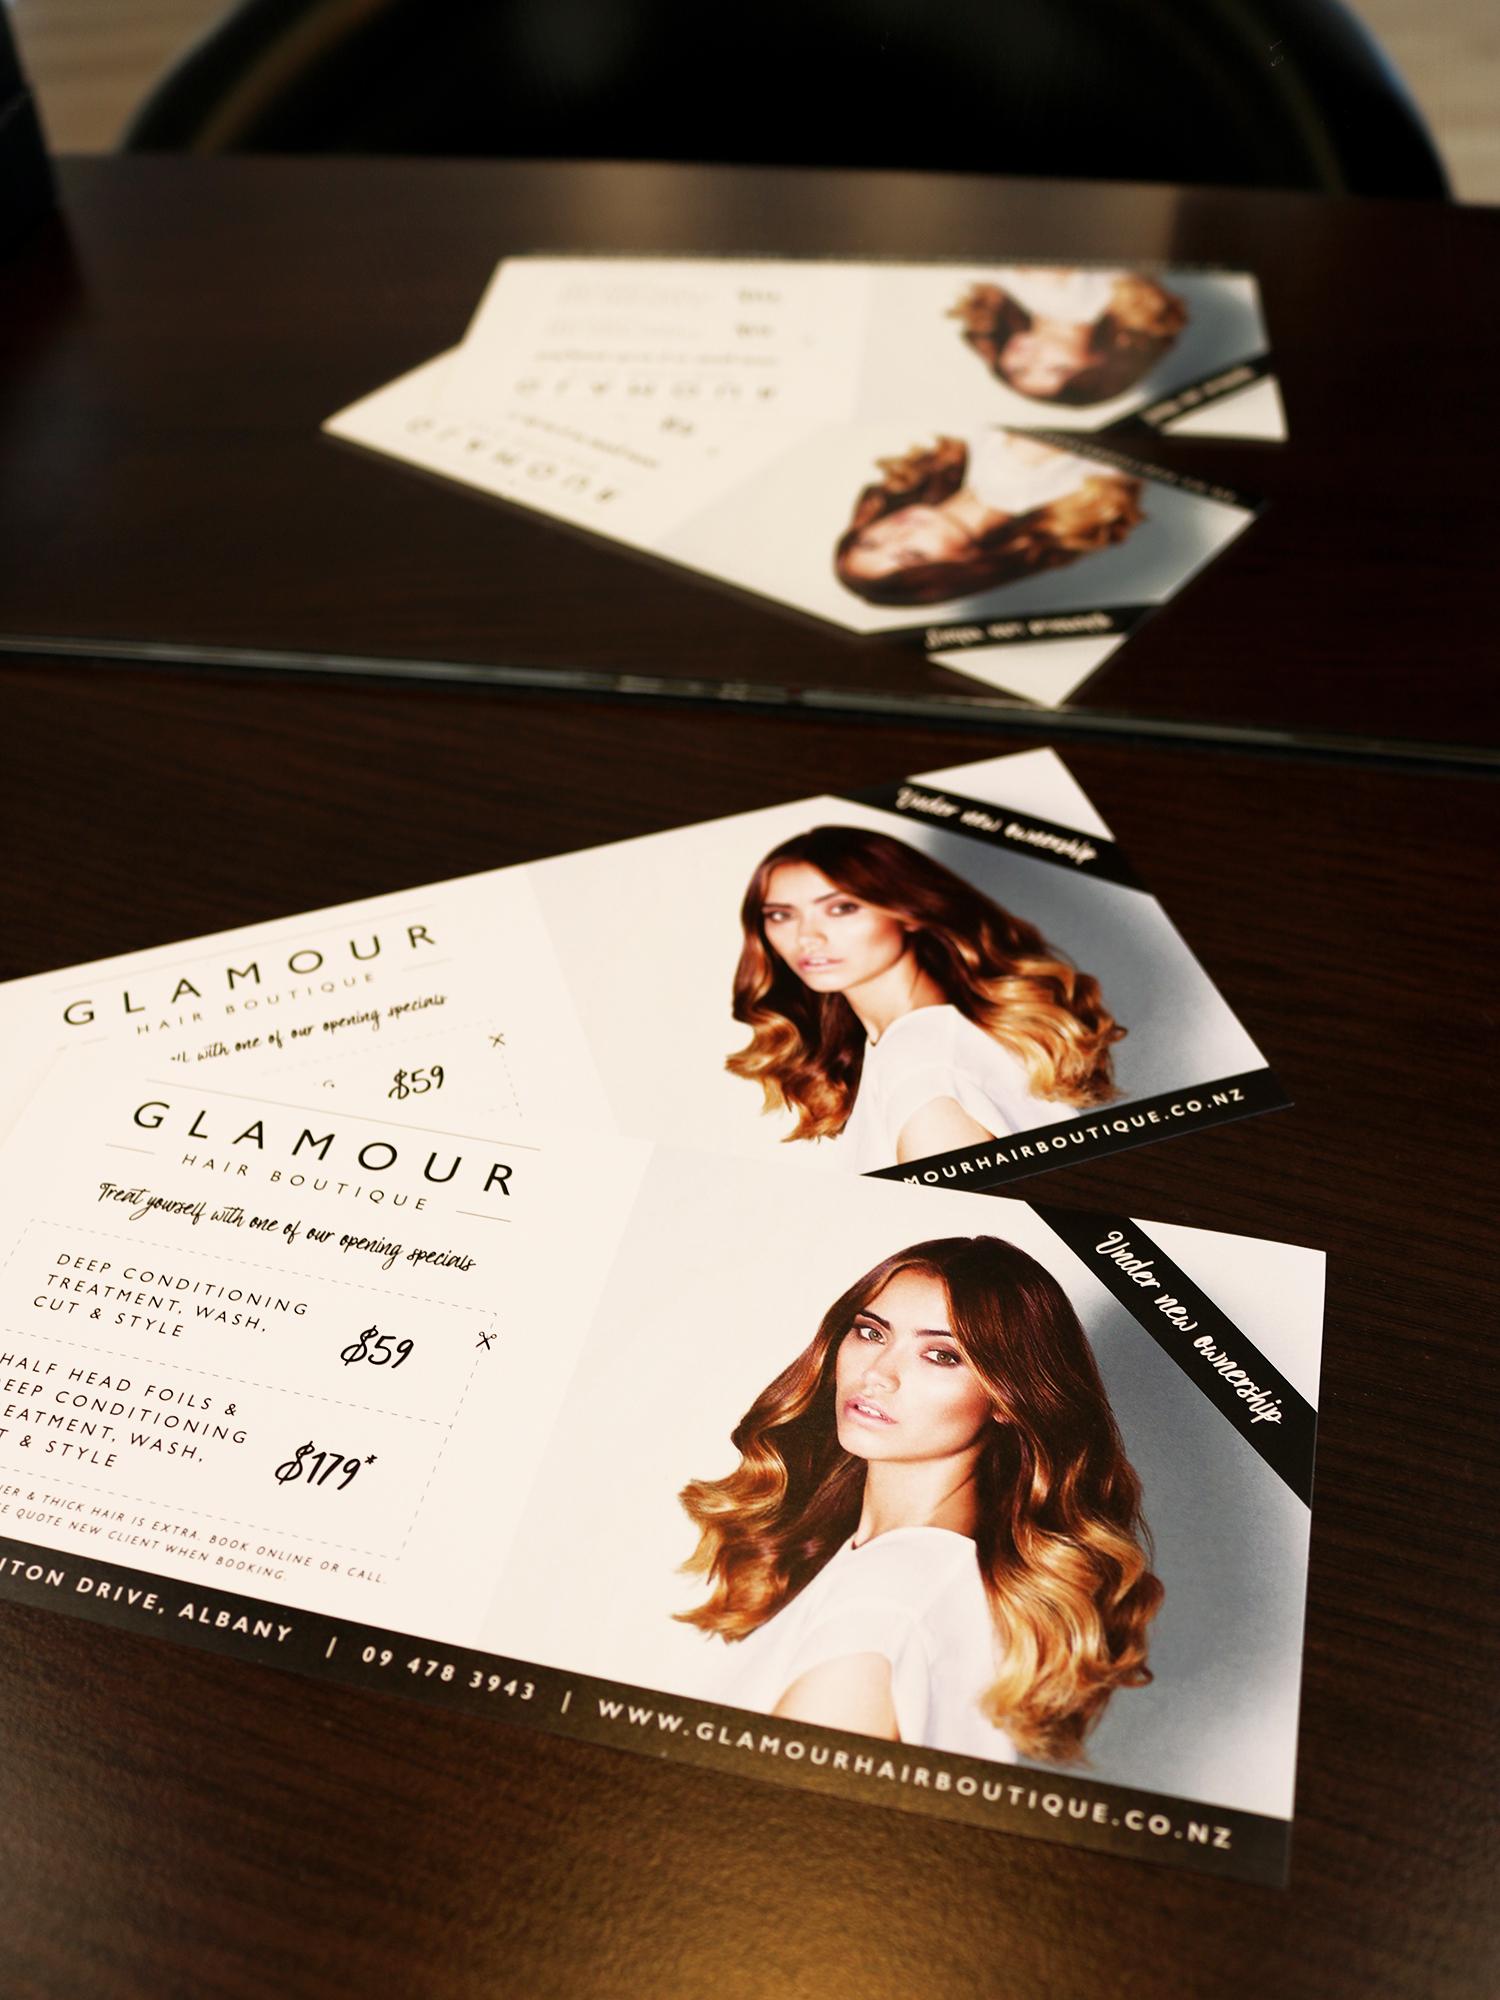 Glamour Hair Boutique DLE Flyer Design